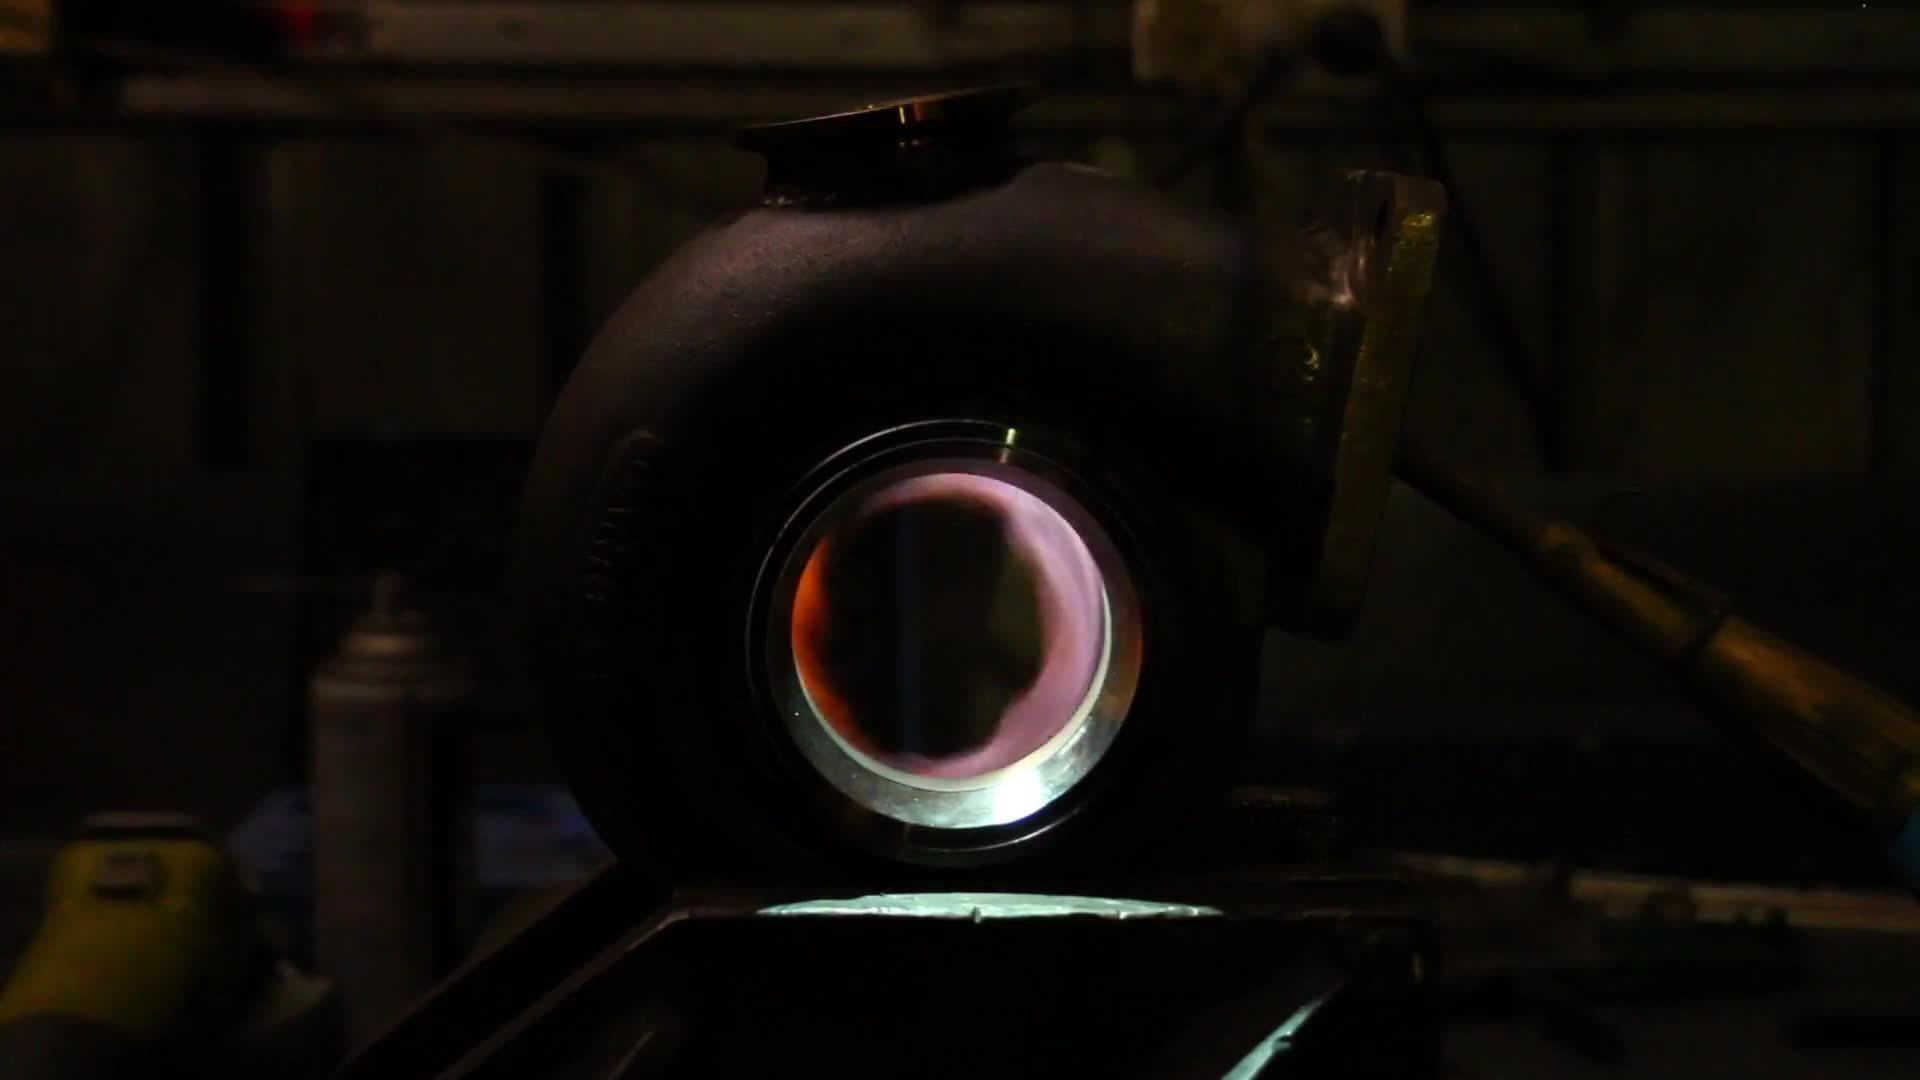 marty, mightycarmods, moog, Nissan Stagea 'Double Unicorn' Build - Turbo heatup GIFs